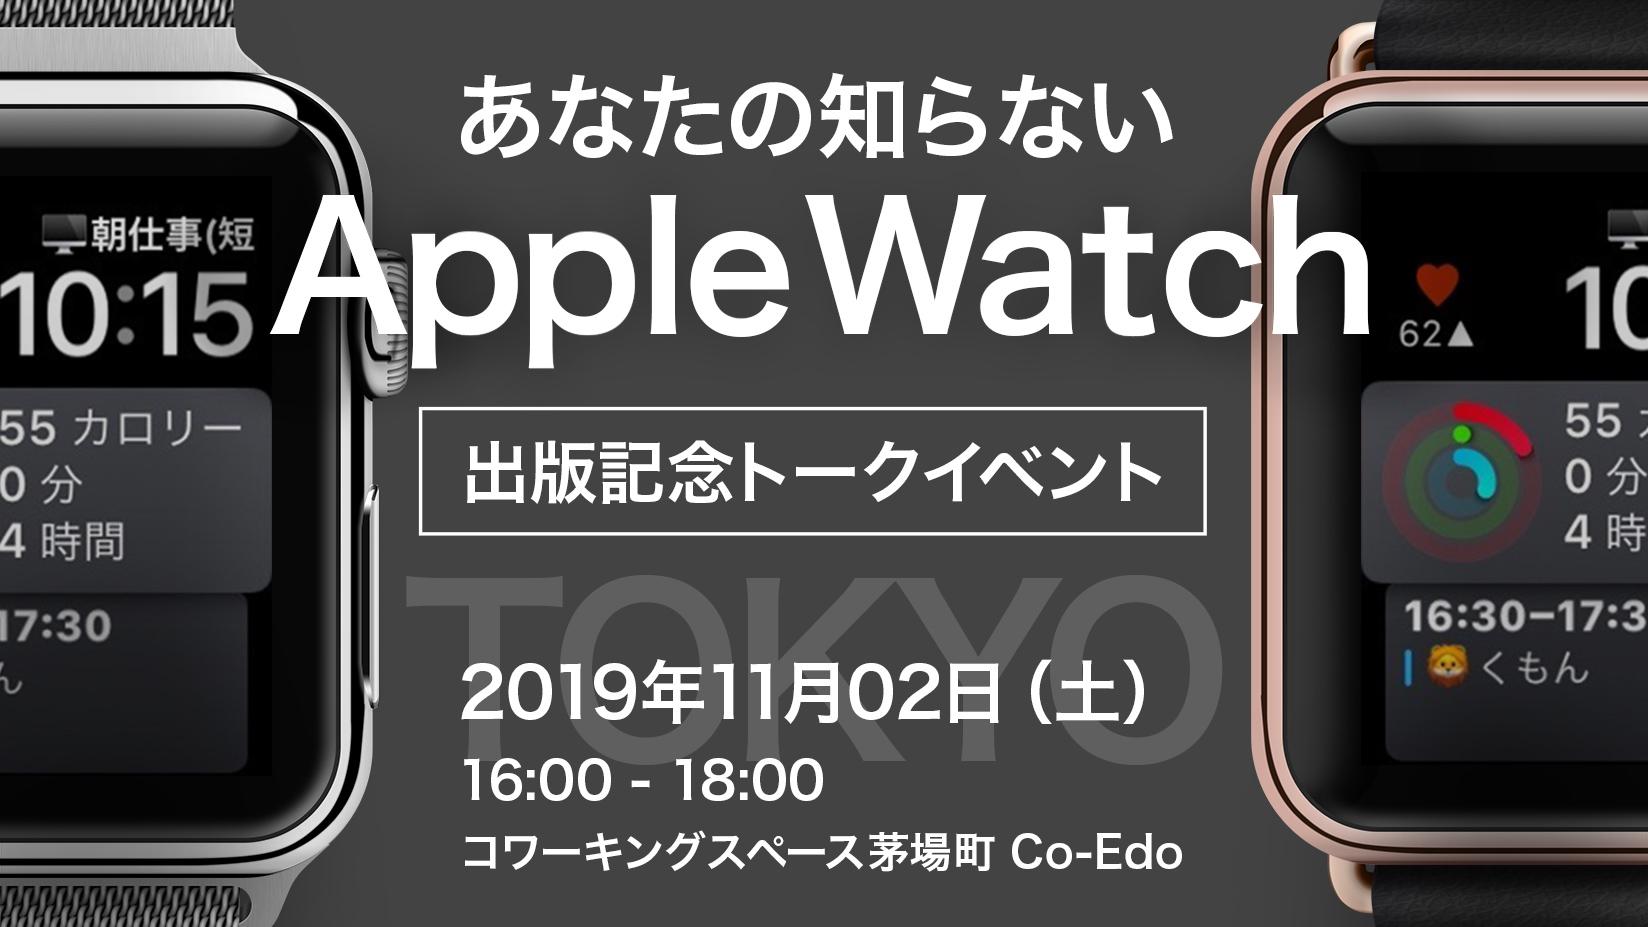 AppleWatch対談本出版記念トークイベント告知バナー